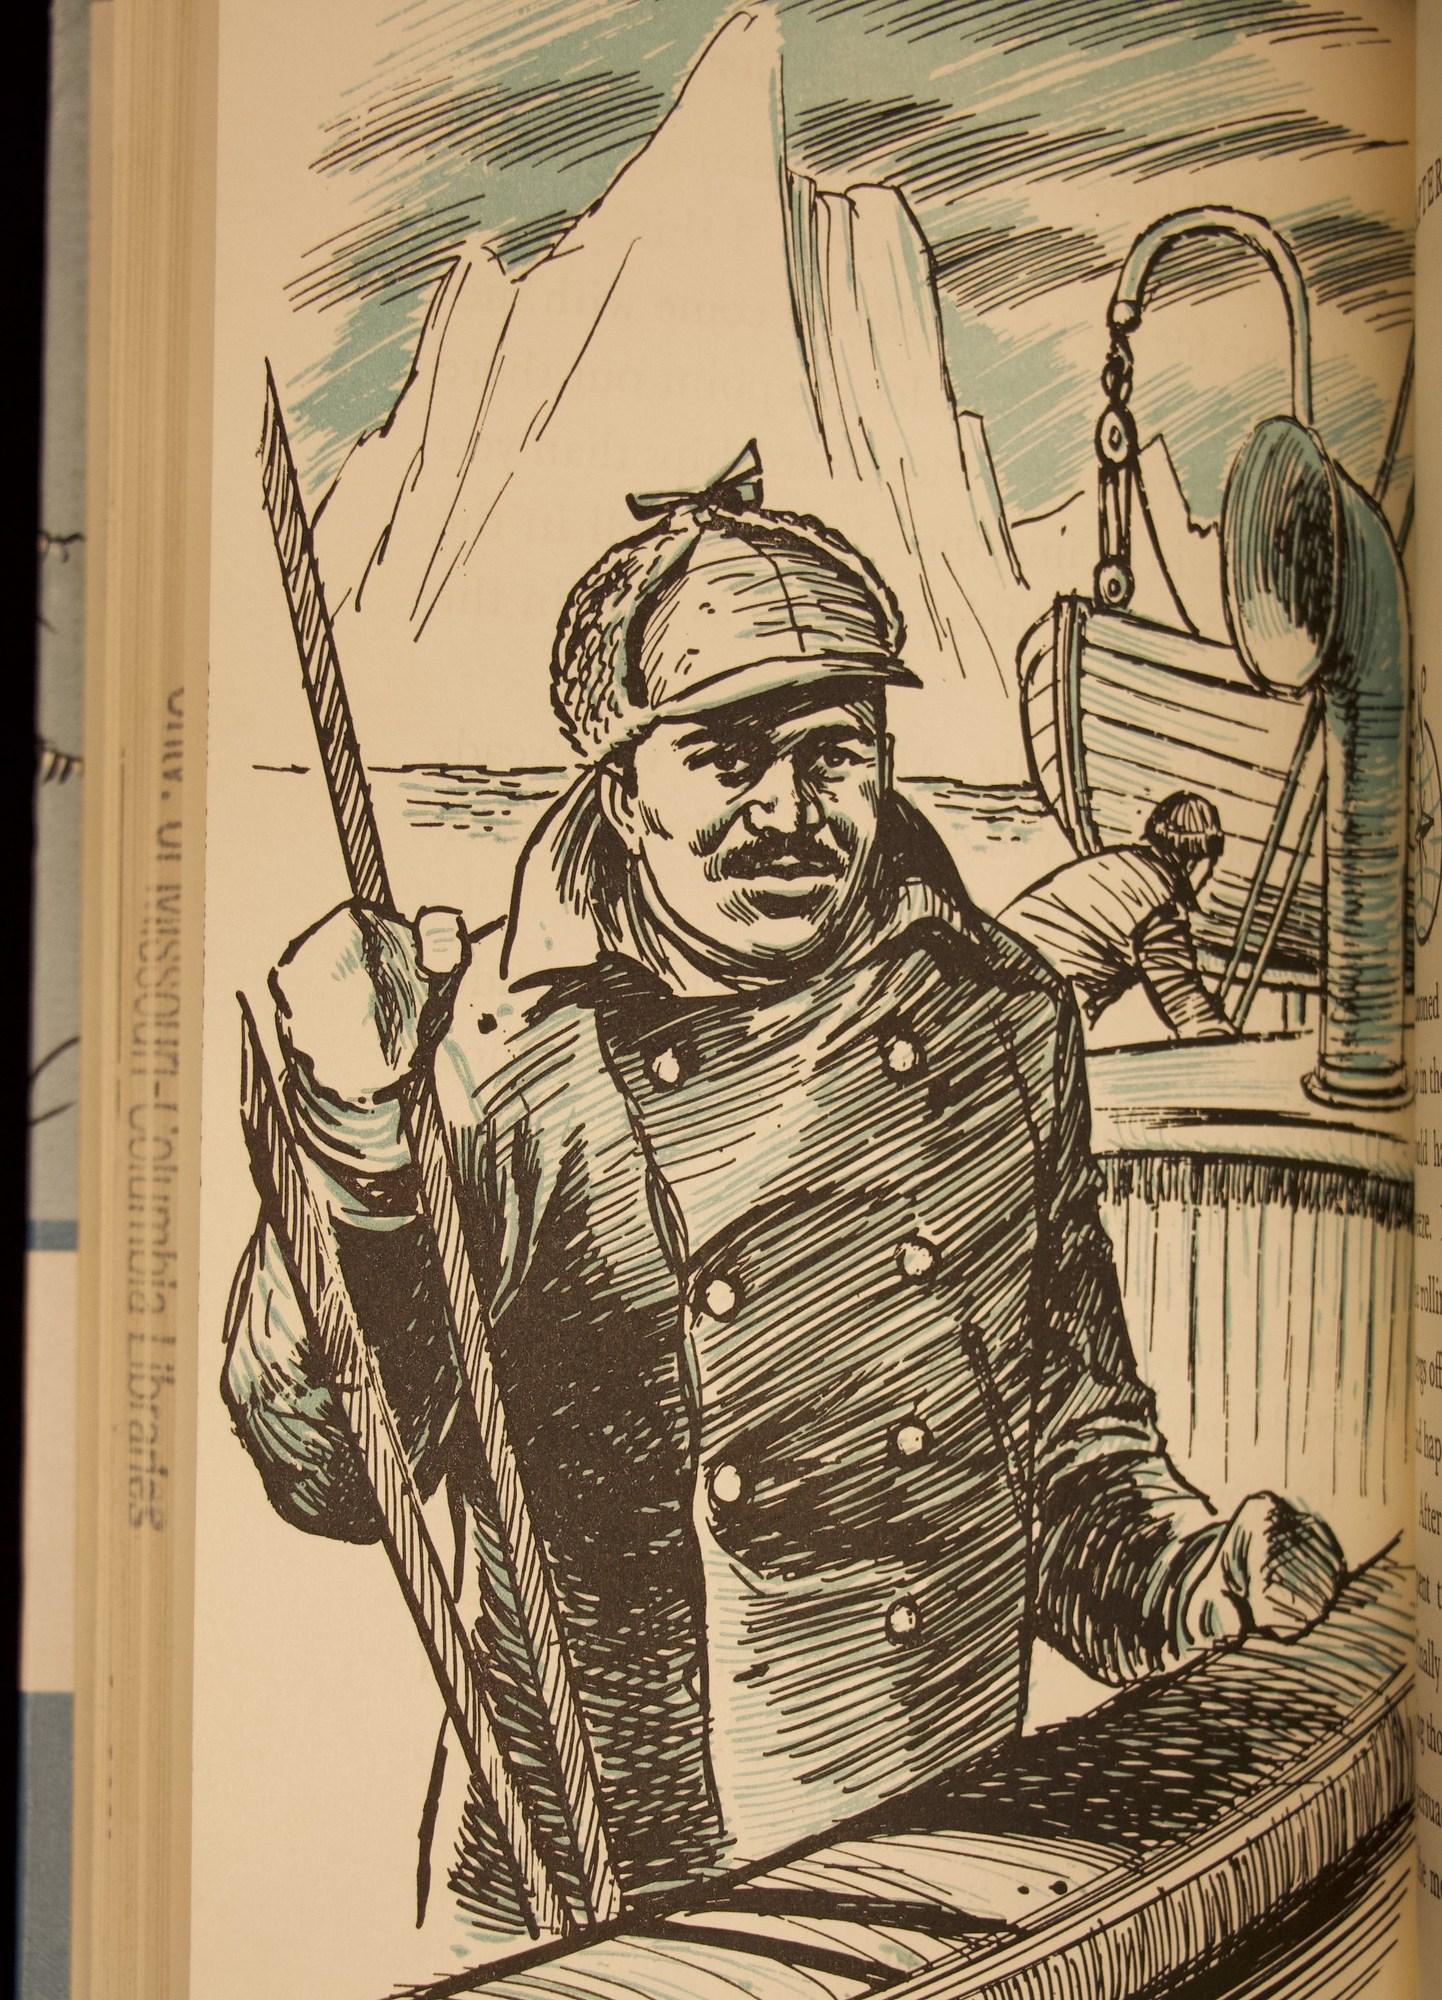 Matthew Henson : arctic hero / [by] Sheldon N. Ripley. Illustrated by E. Harper Johnson.